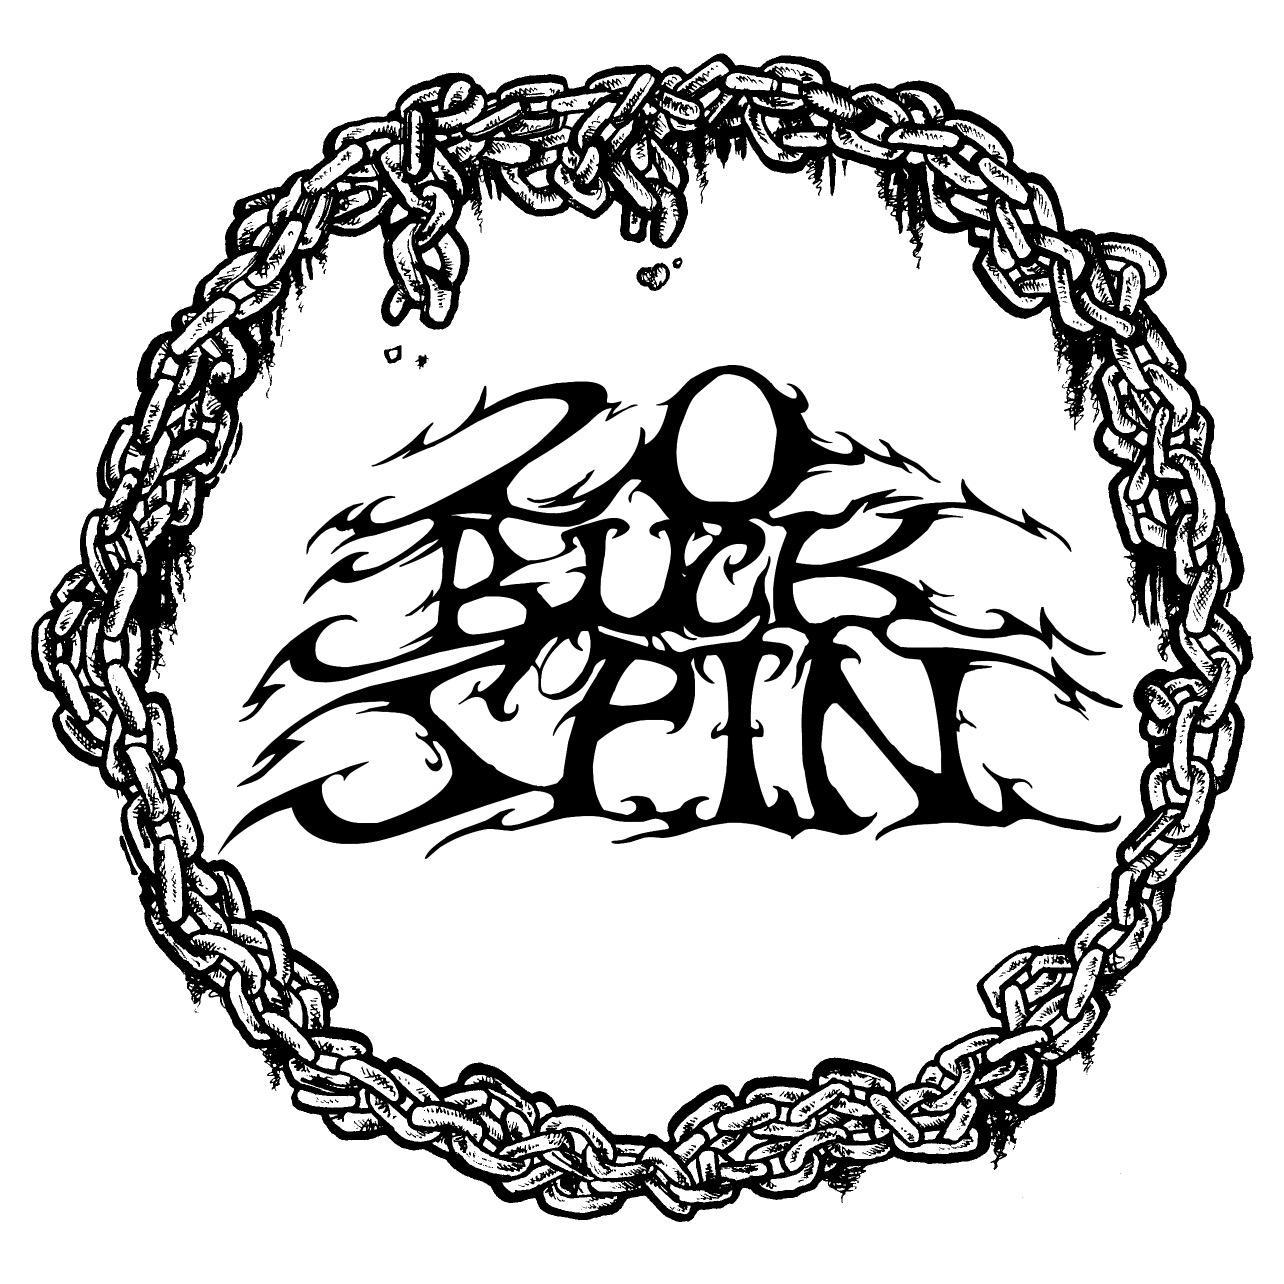 20 buck spin on twitter international women s day playlist 20 by 20 Grid 20 buck spin